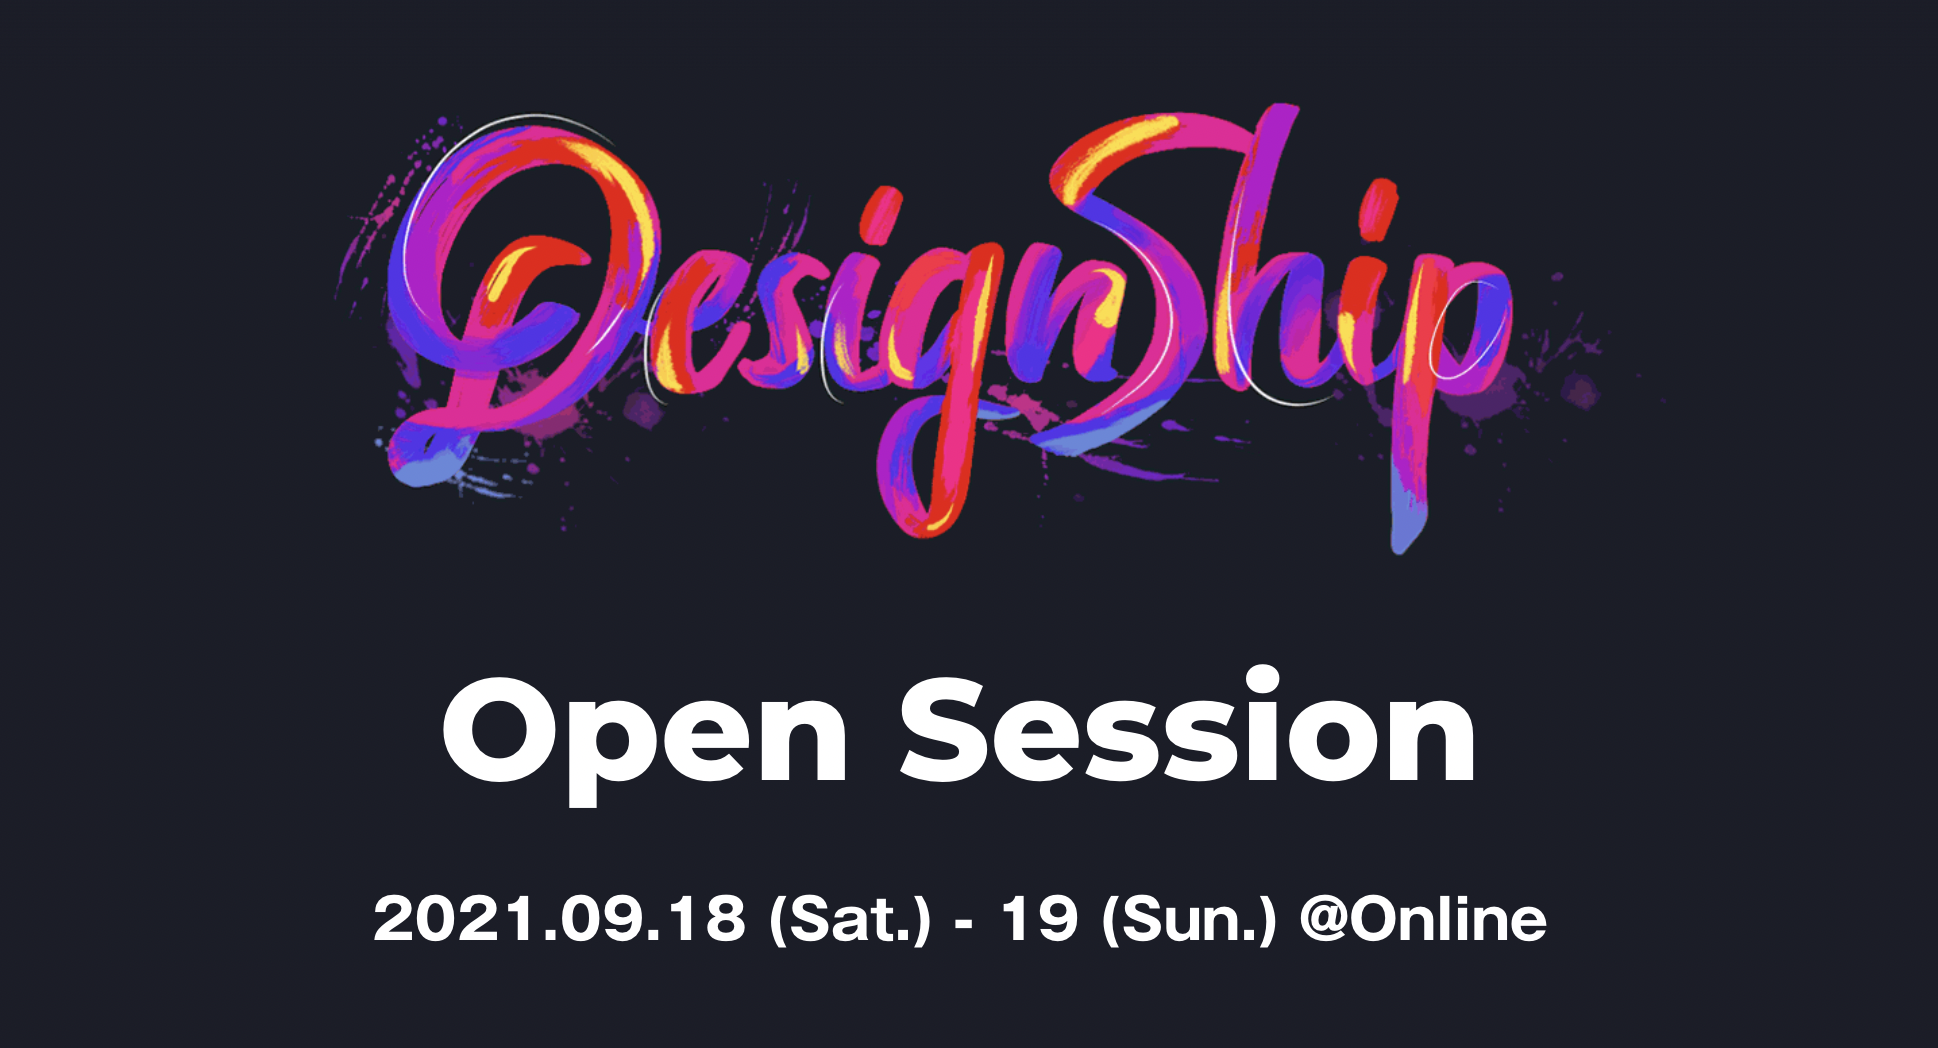 『Designship 2021 Open Session』にCDOの篠原が登壇